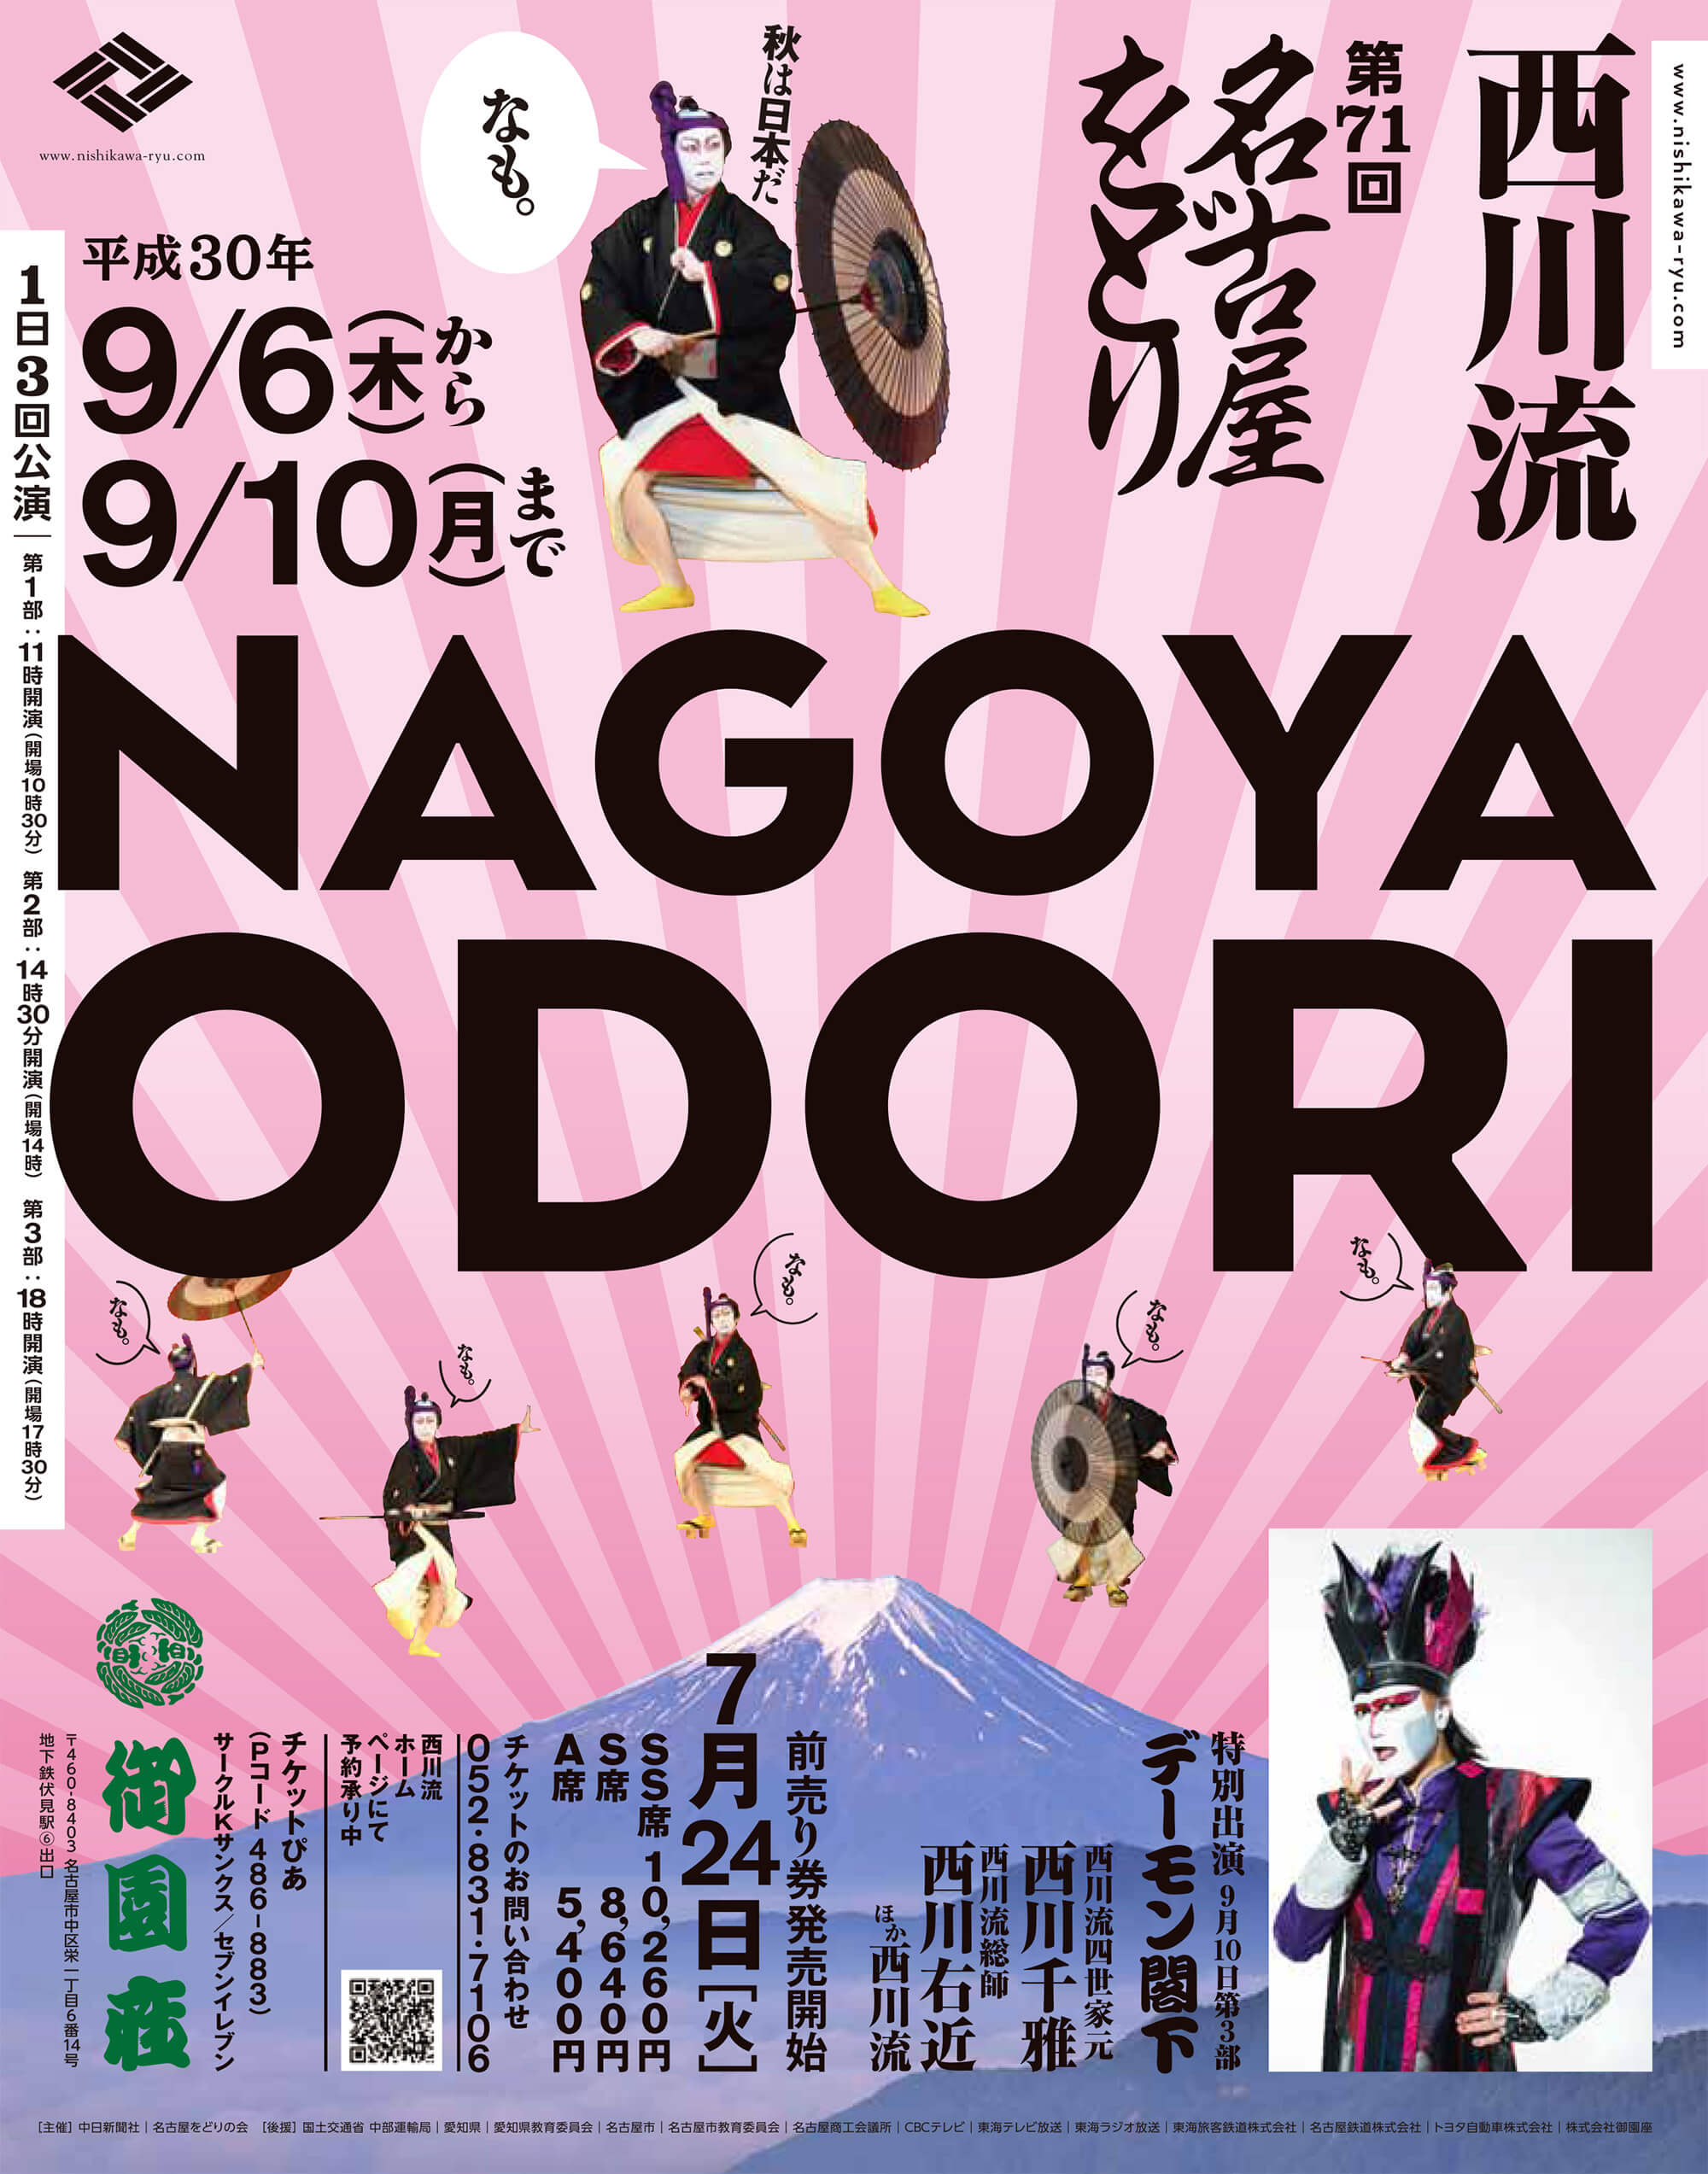 Nagoya Odori 2018 poster